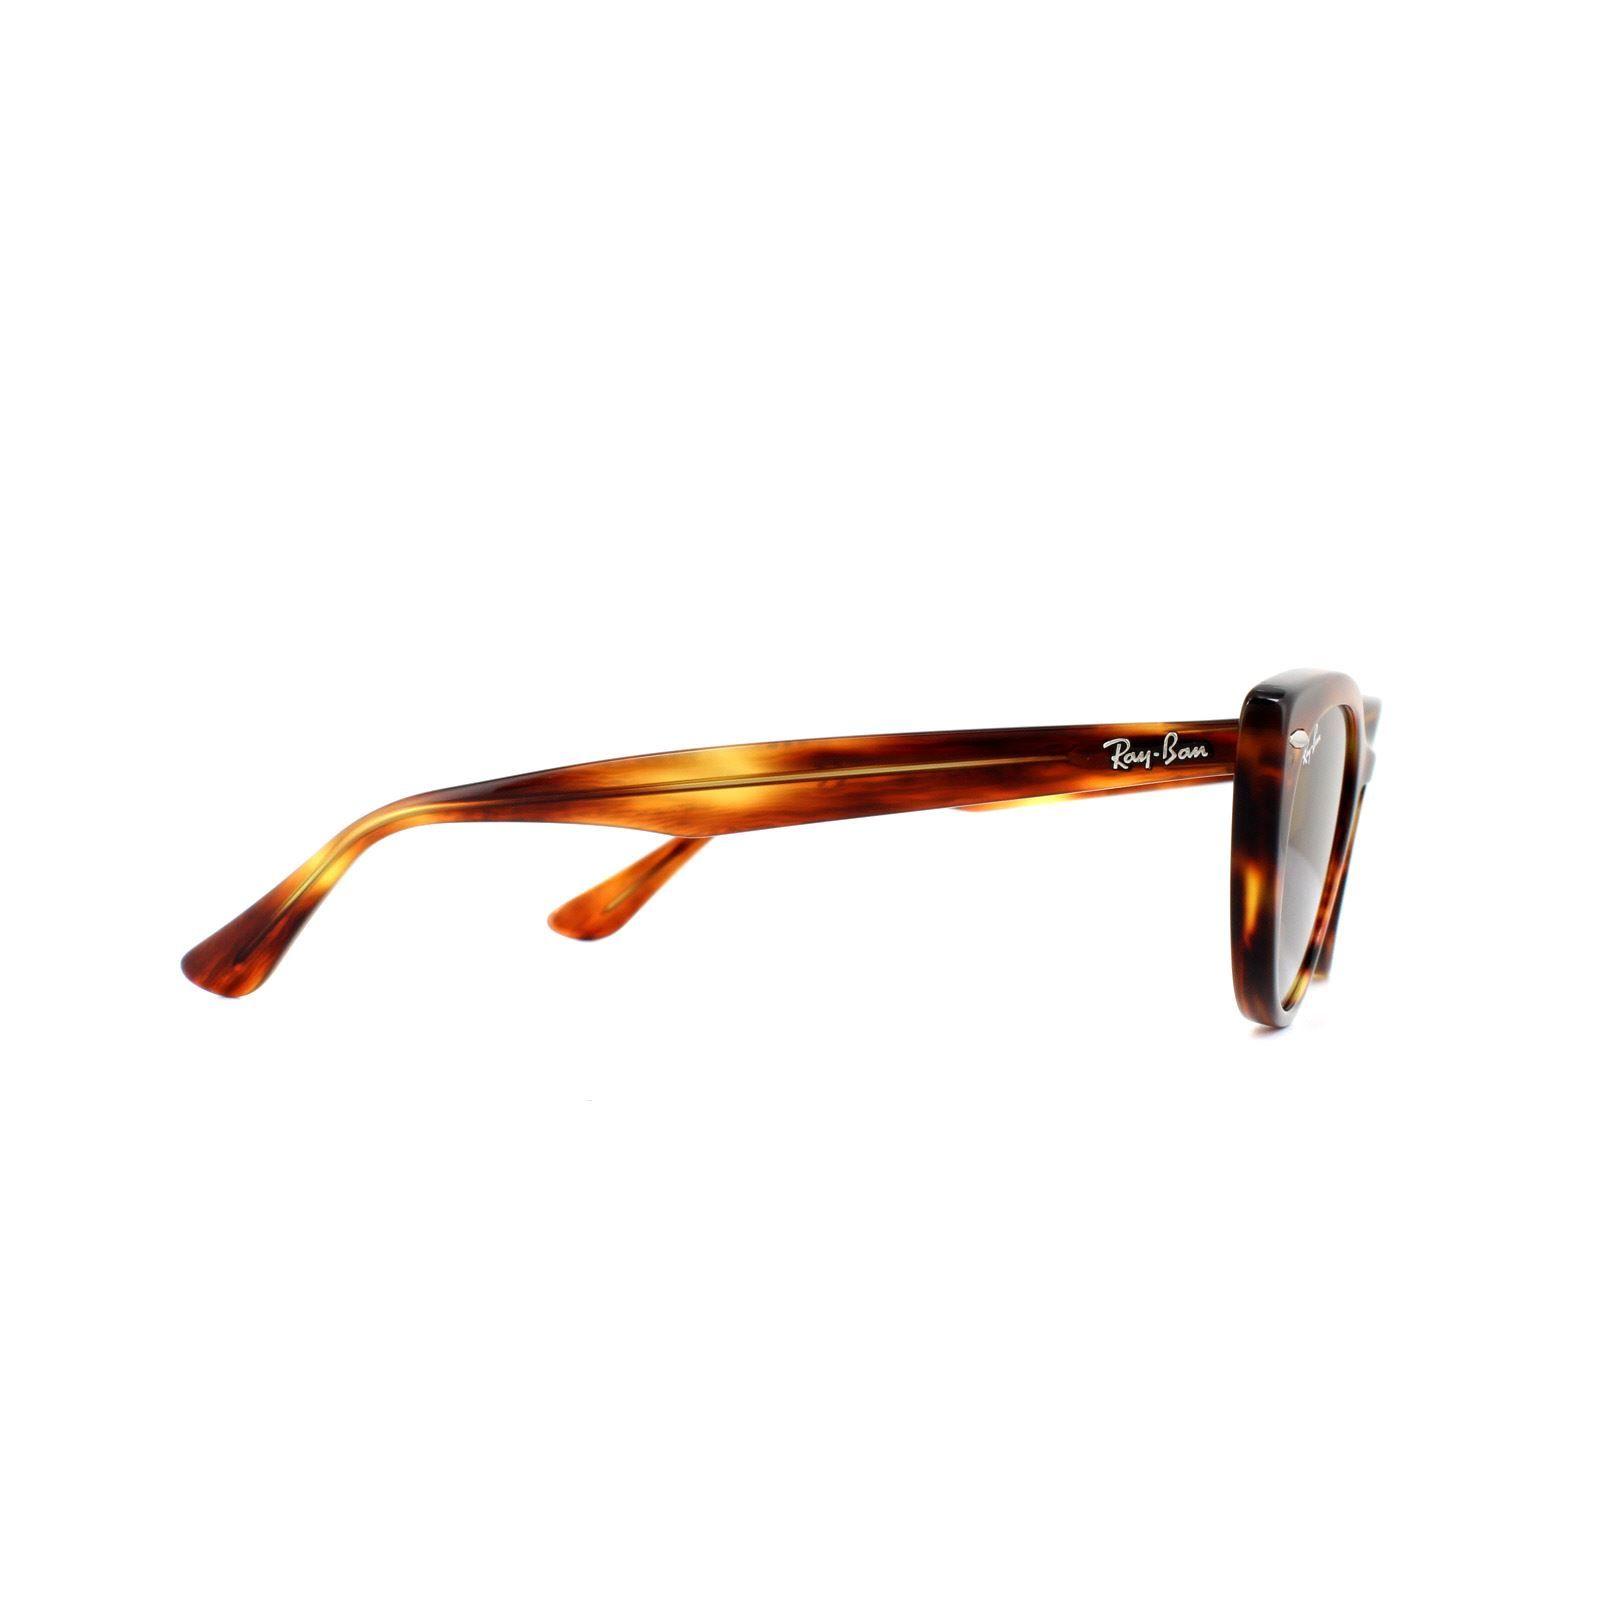 Ray-Ban Sunglasses Nina RB4314N 954/33 Havana Brown